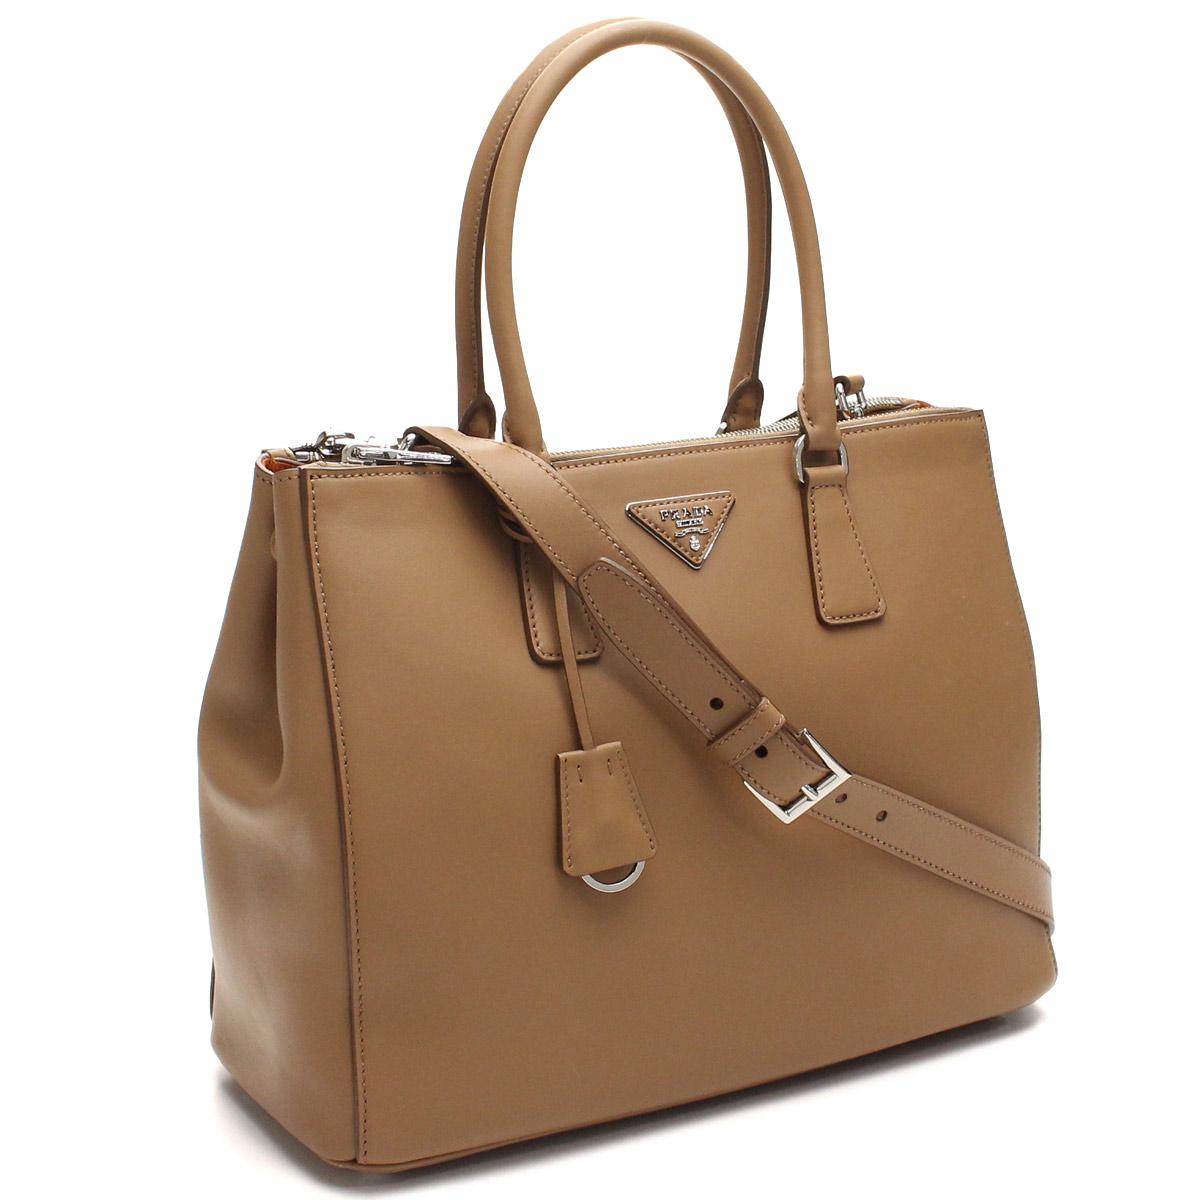 f3e7916d1e2c Bighit The total brand wholesale  Prada (PRADA) tote bag 1BA274-2AIX-F0NV3  CARAMEL   Brown PAPAYA( taxfree send by EMS authentic A brand new item ) ...